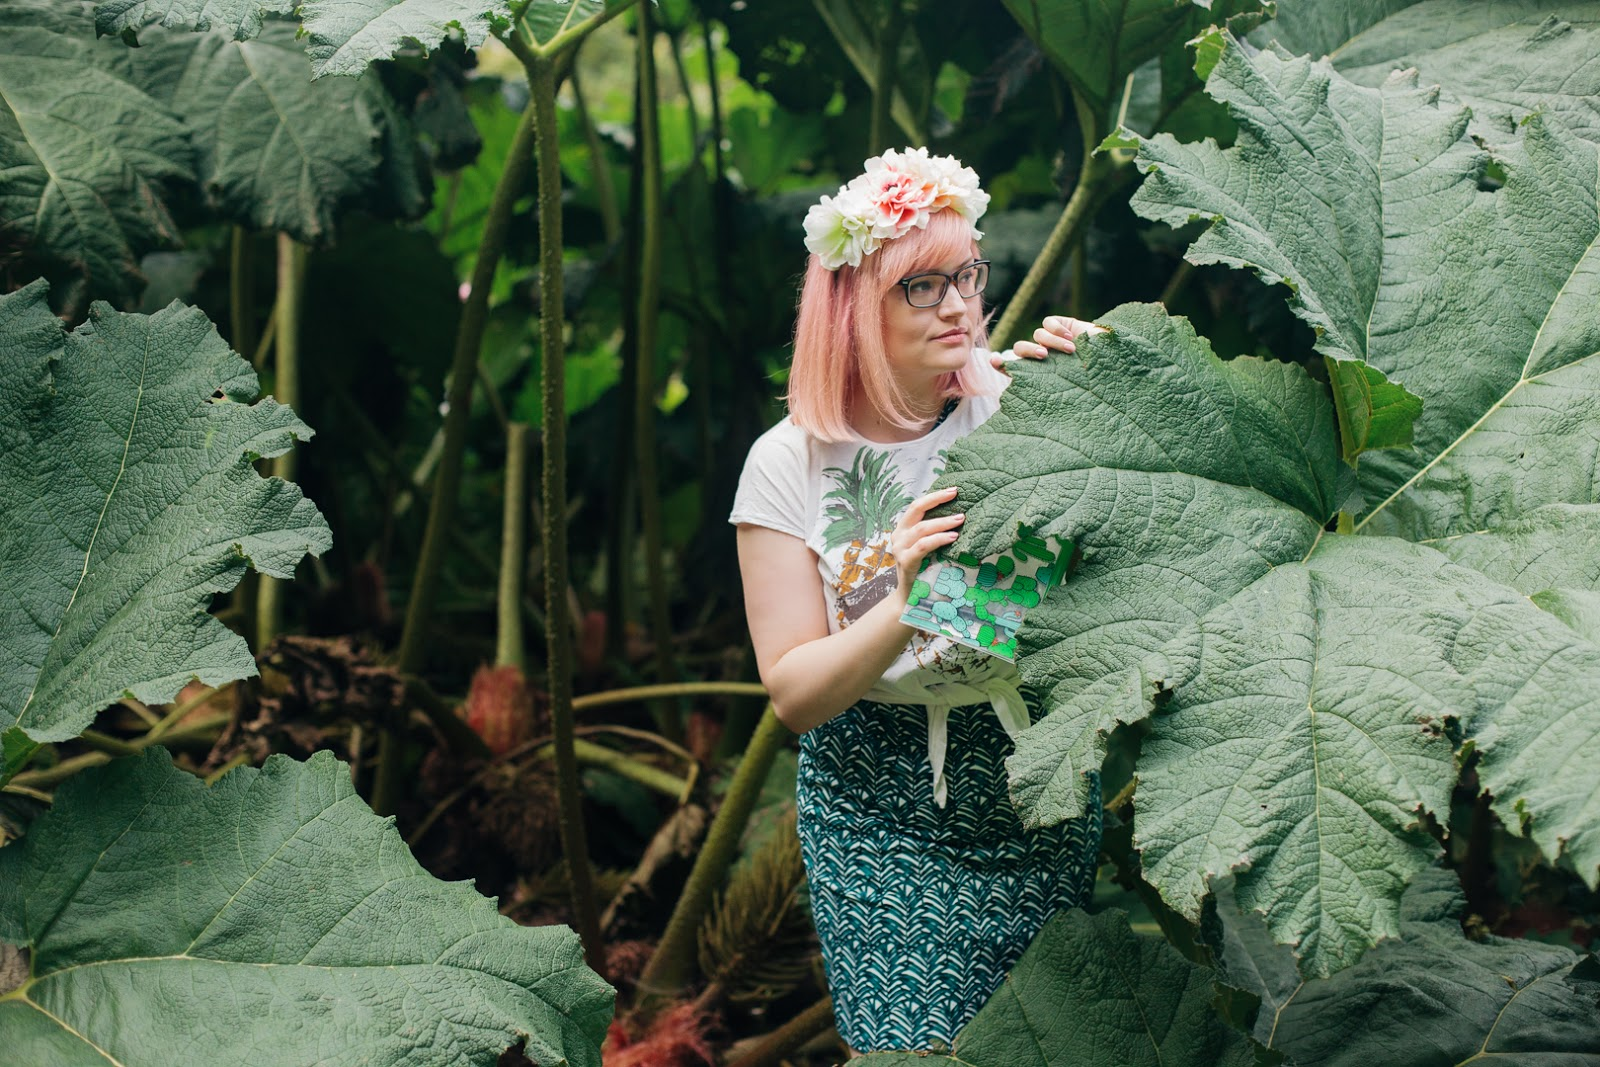 girls with glasses, 2020 opticians, Scottish blogger, peach hair DIY, blogger favourite hair, banana leaf print,Royal Botanical Garden Edinburgh, cryptomgamic garden